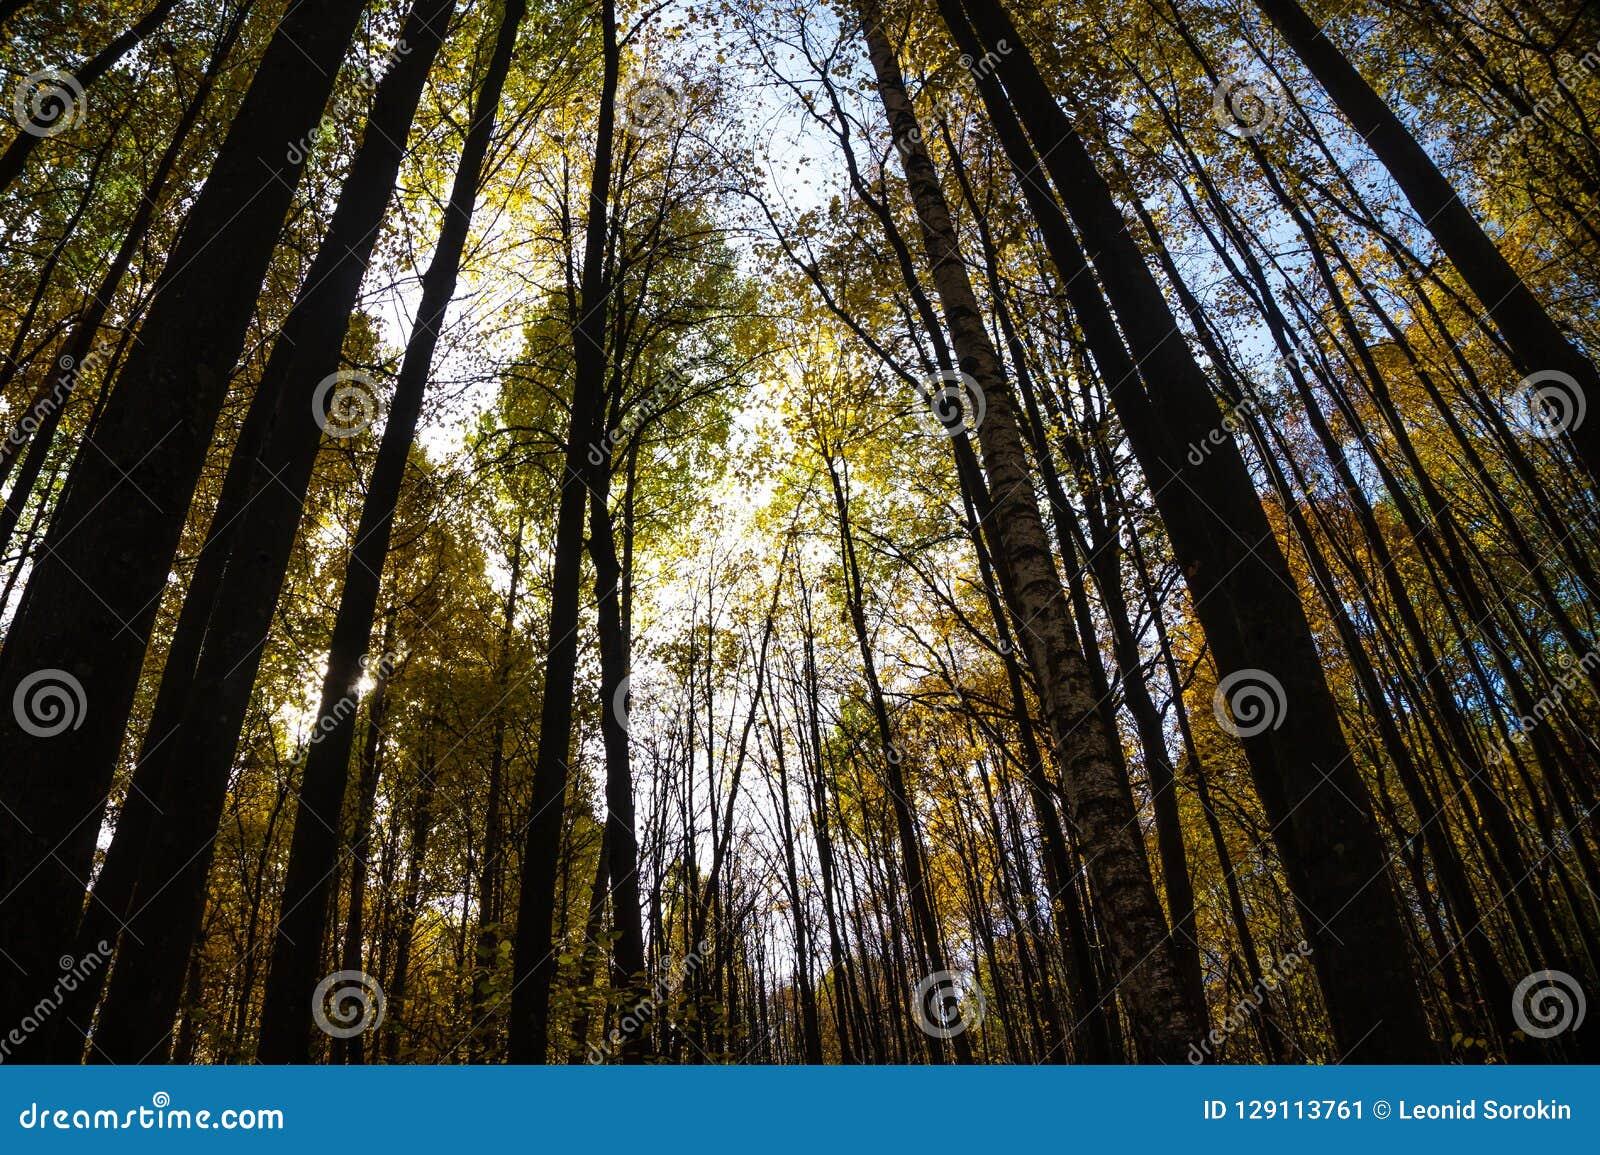 Herbstbäume im Wald am sonnigen Tag